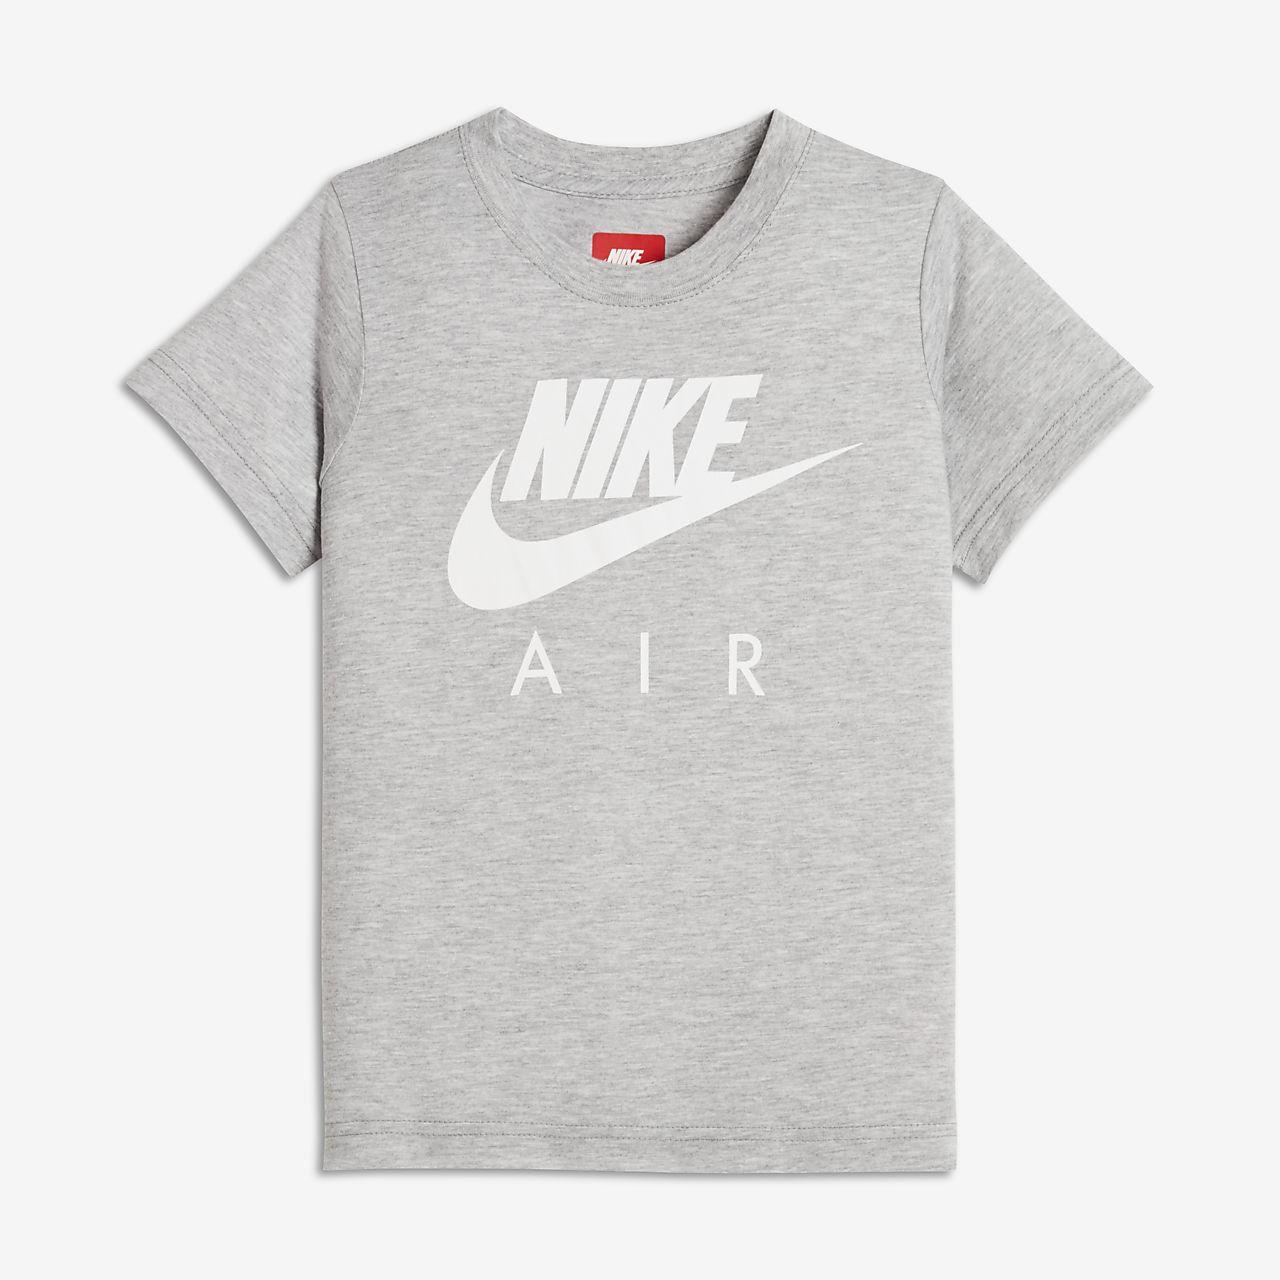 T-Shirt Nike Air Hybrid για μικρά αγόρια